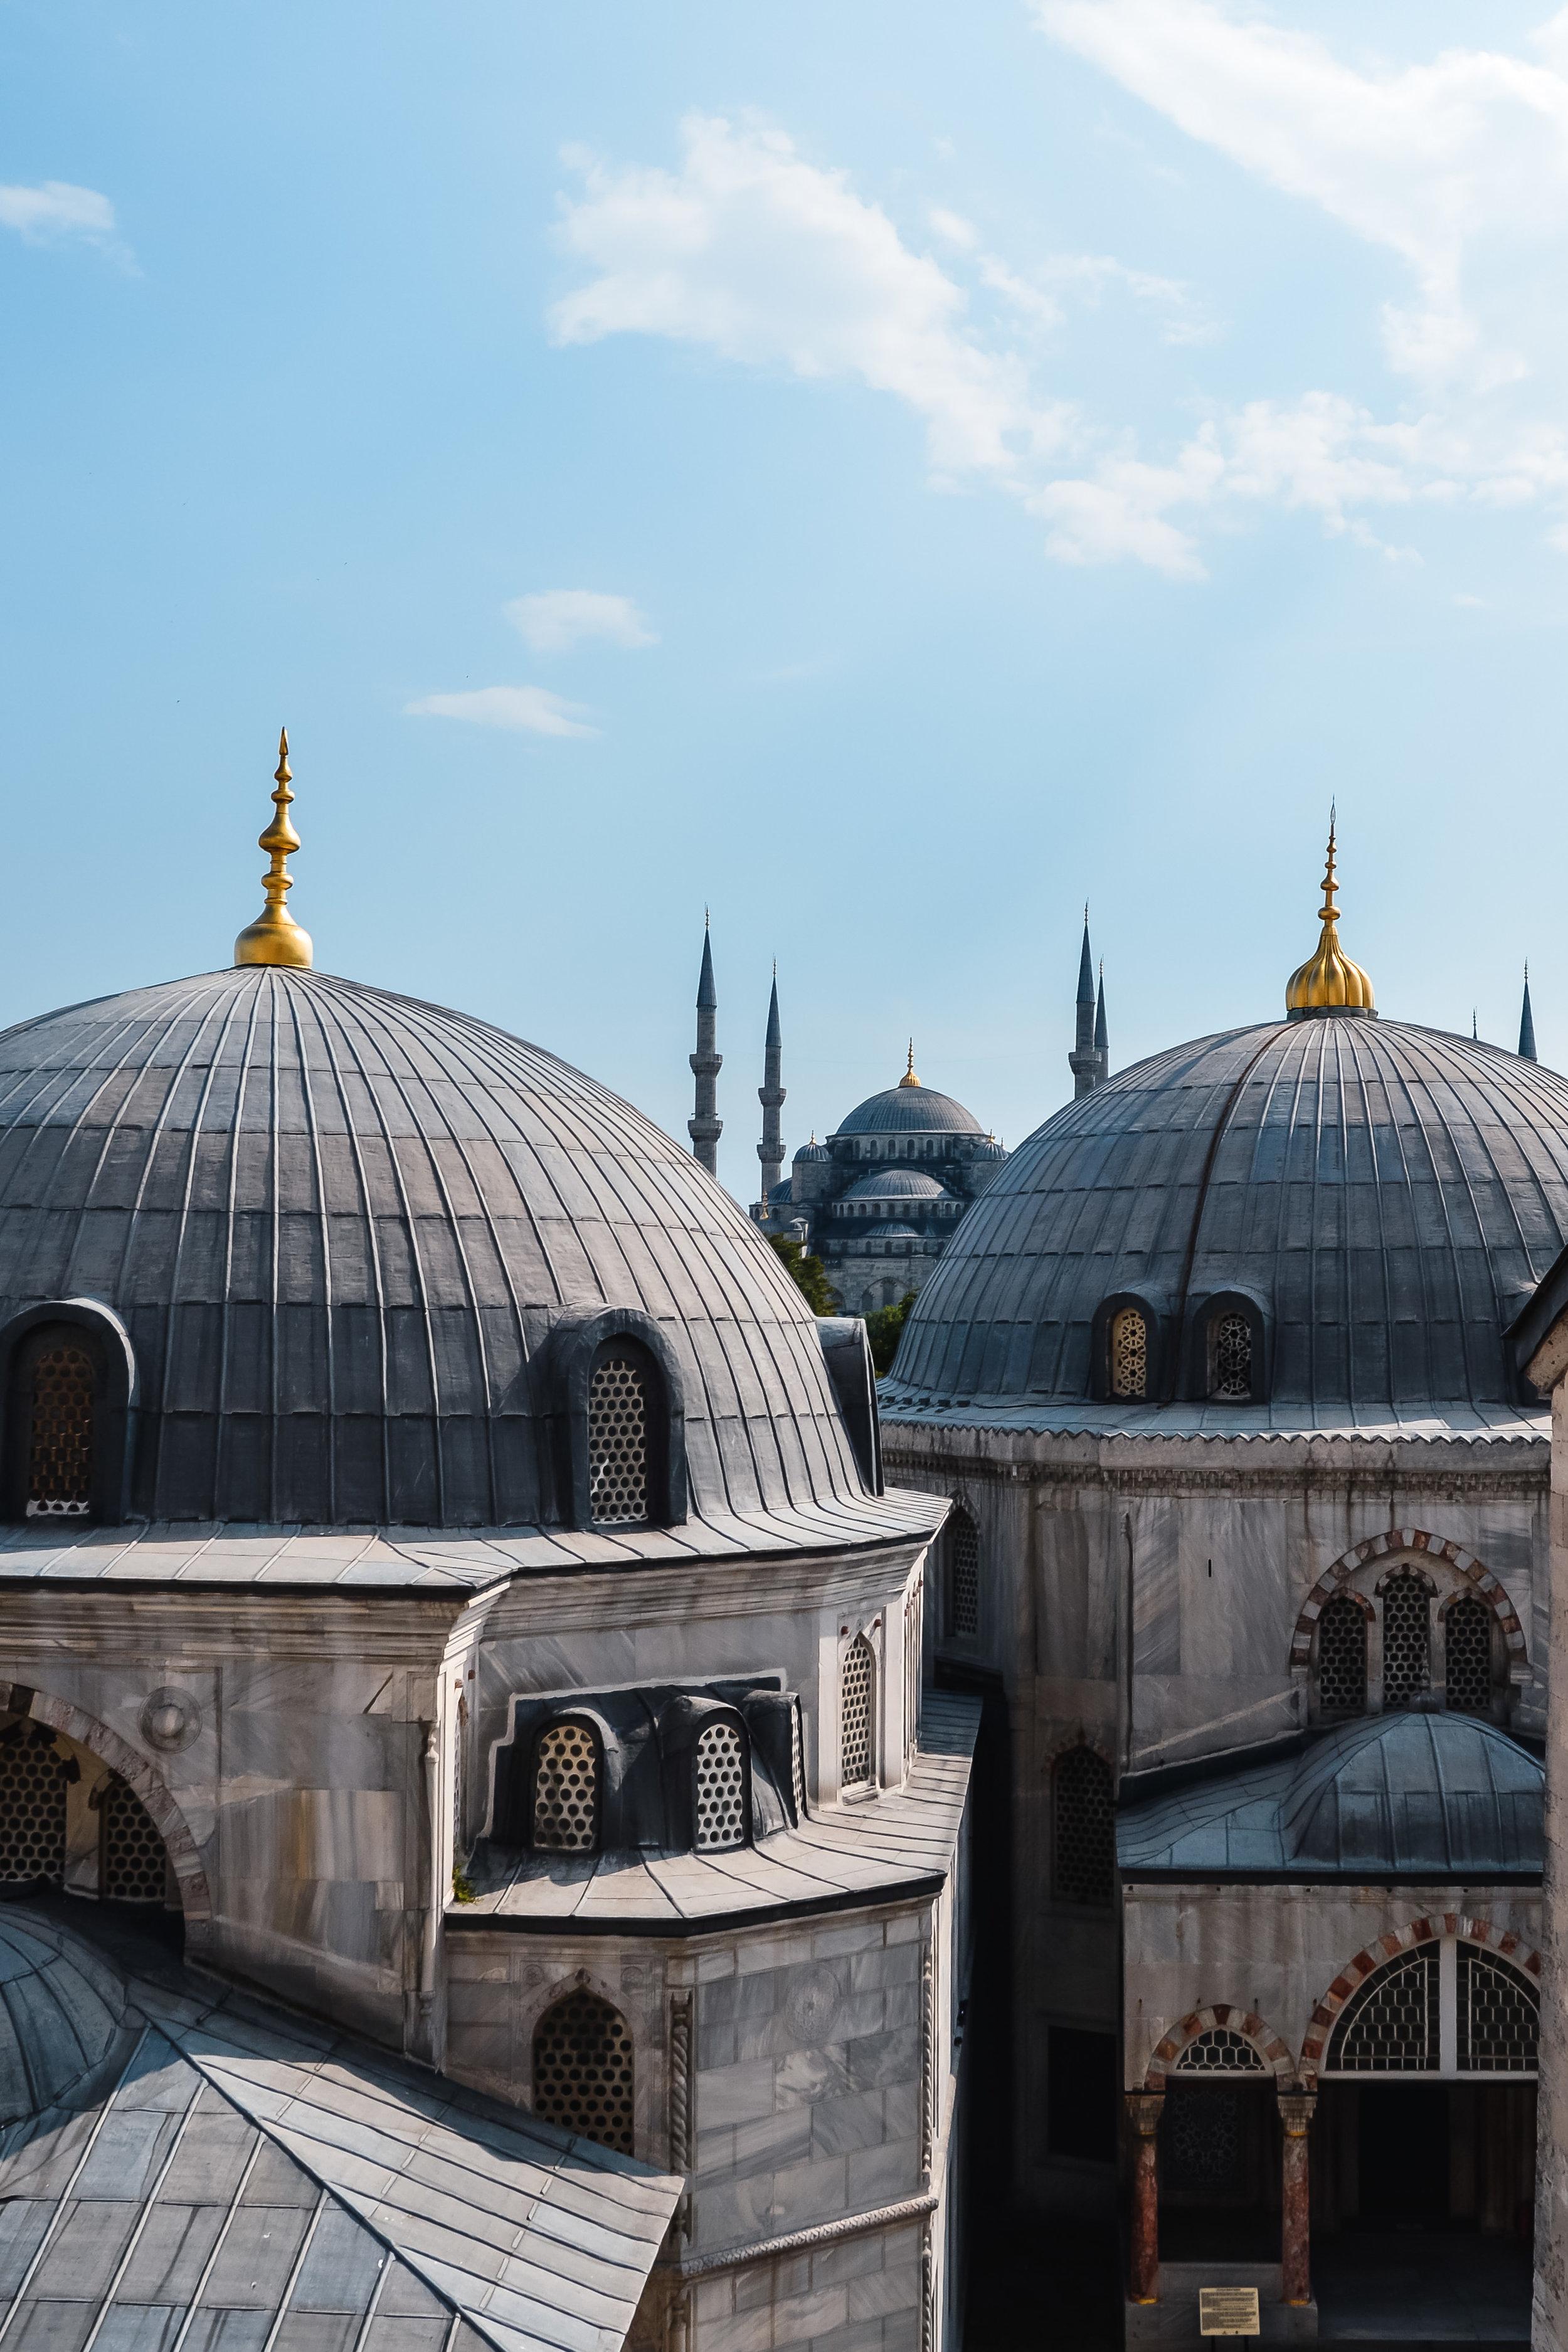 Blue Mosque Minaret Sunset Blue Sky Muslim Ottoman Empire Architecture Istanbul Turkey